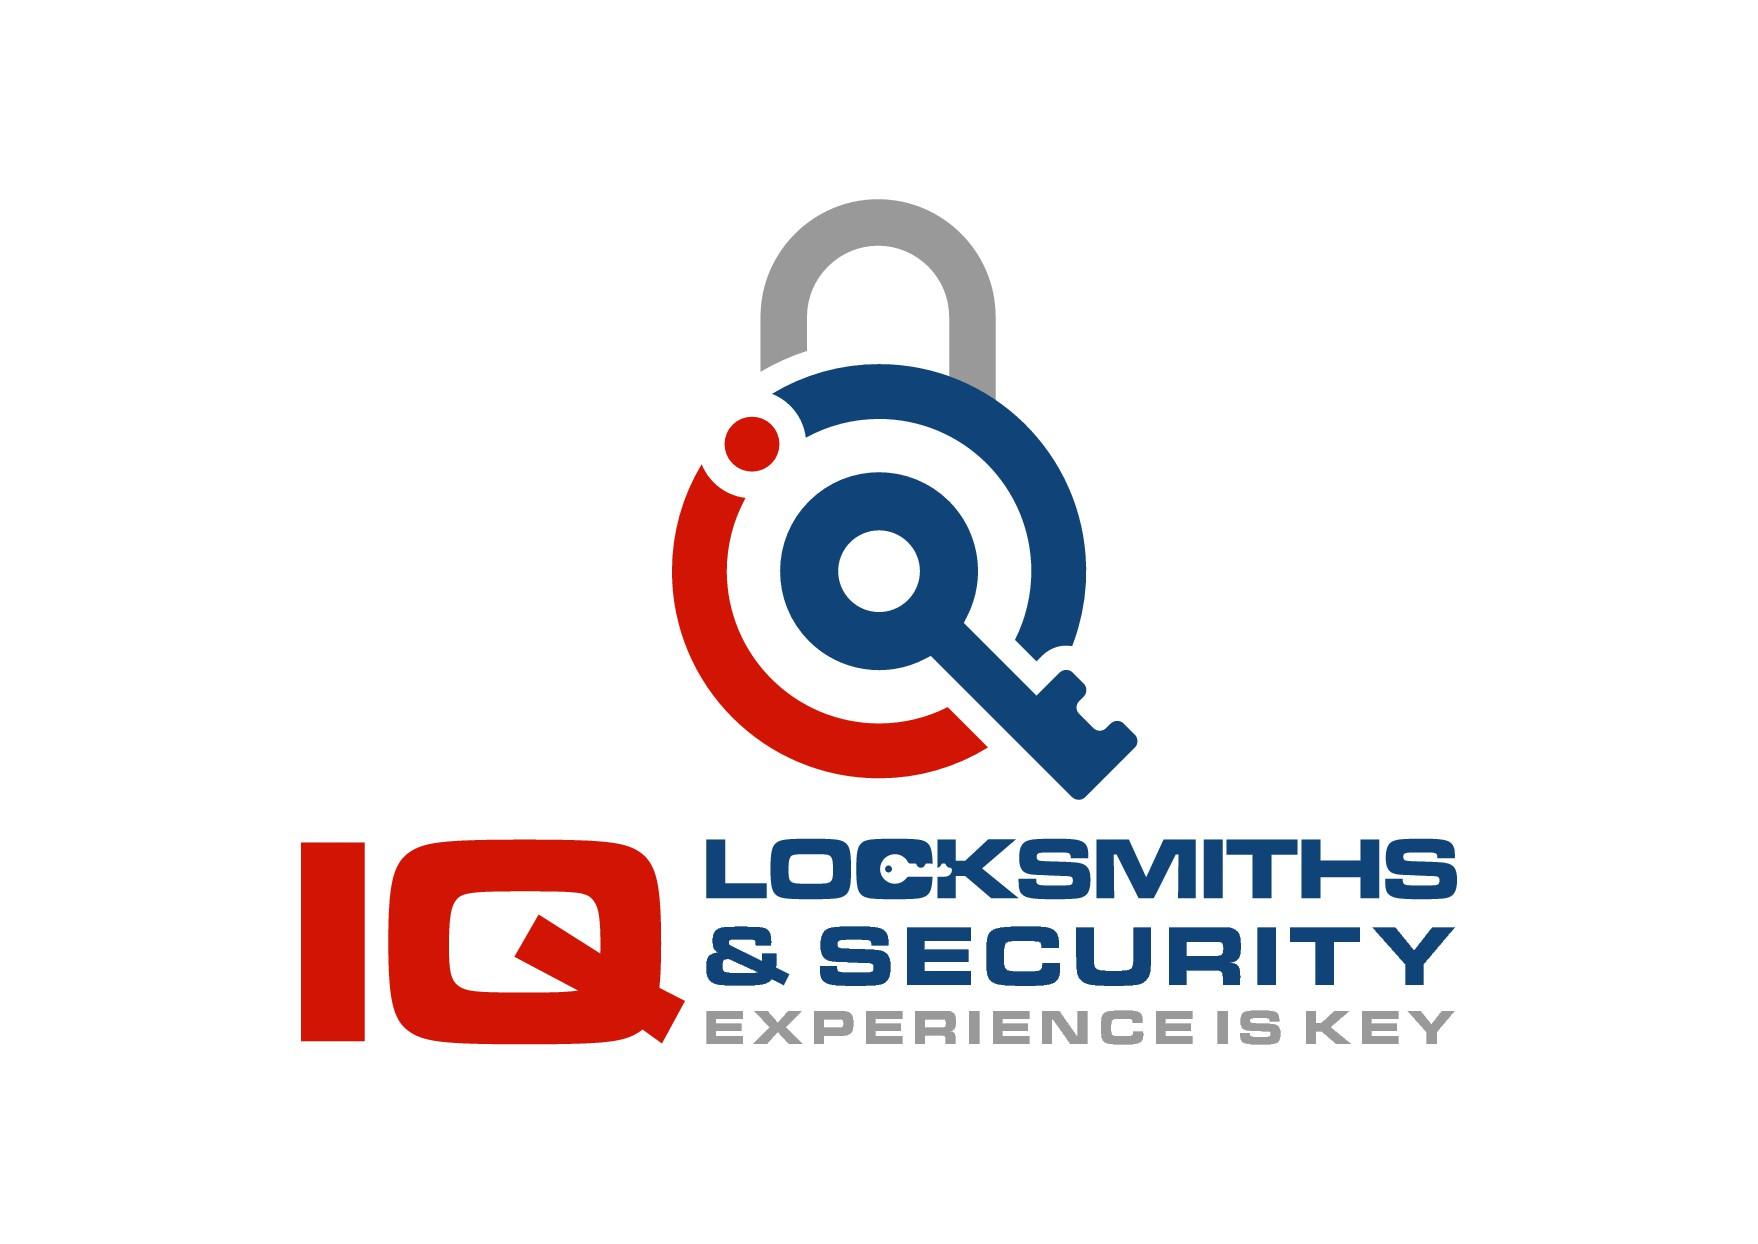 Locksmith seeking an identity